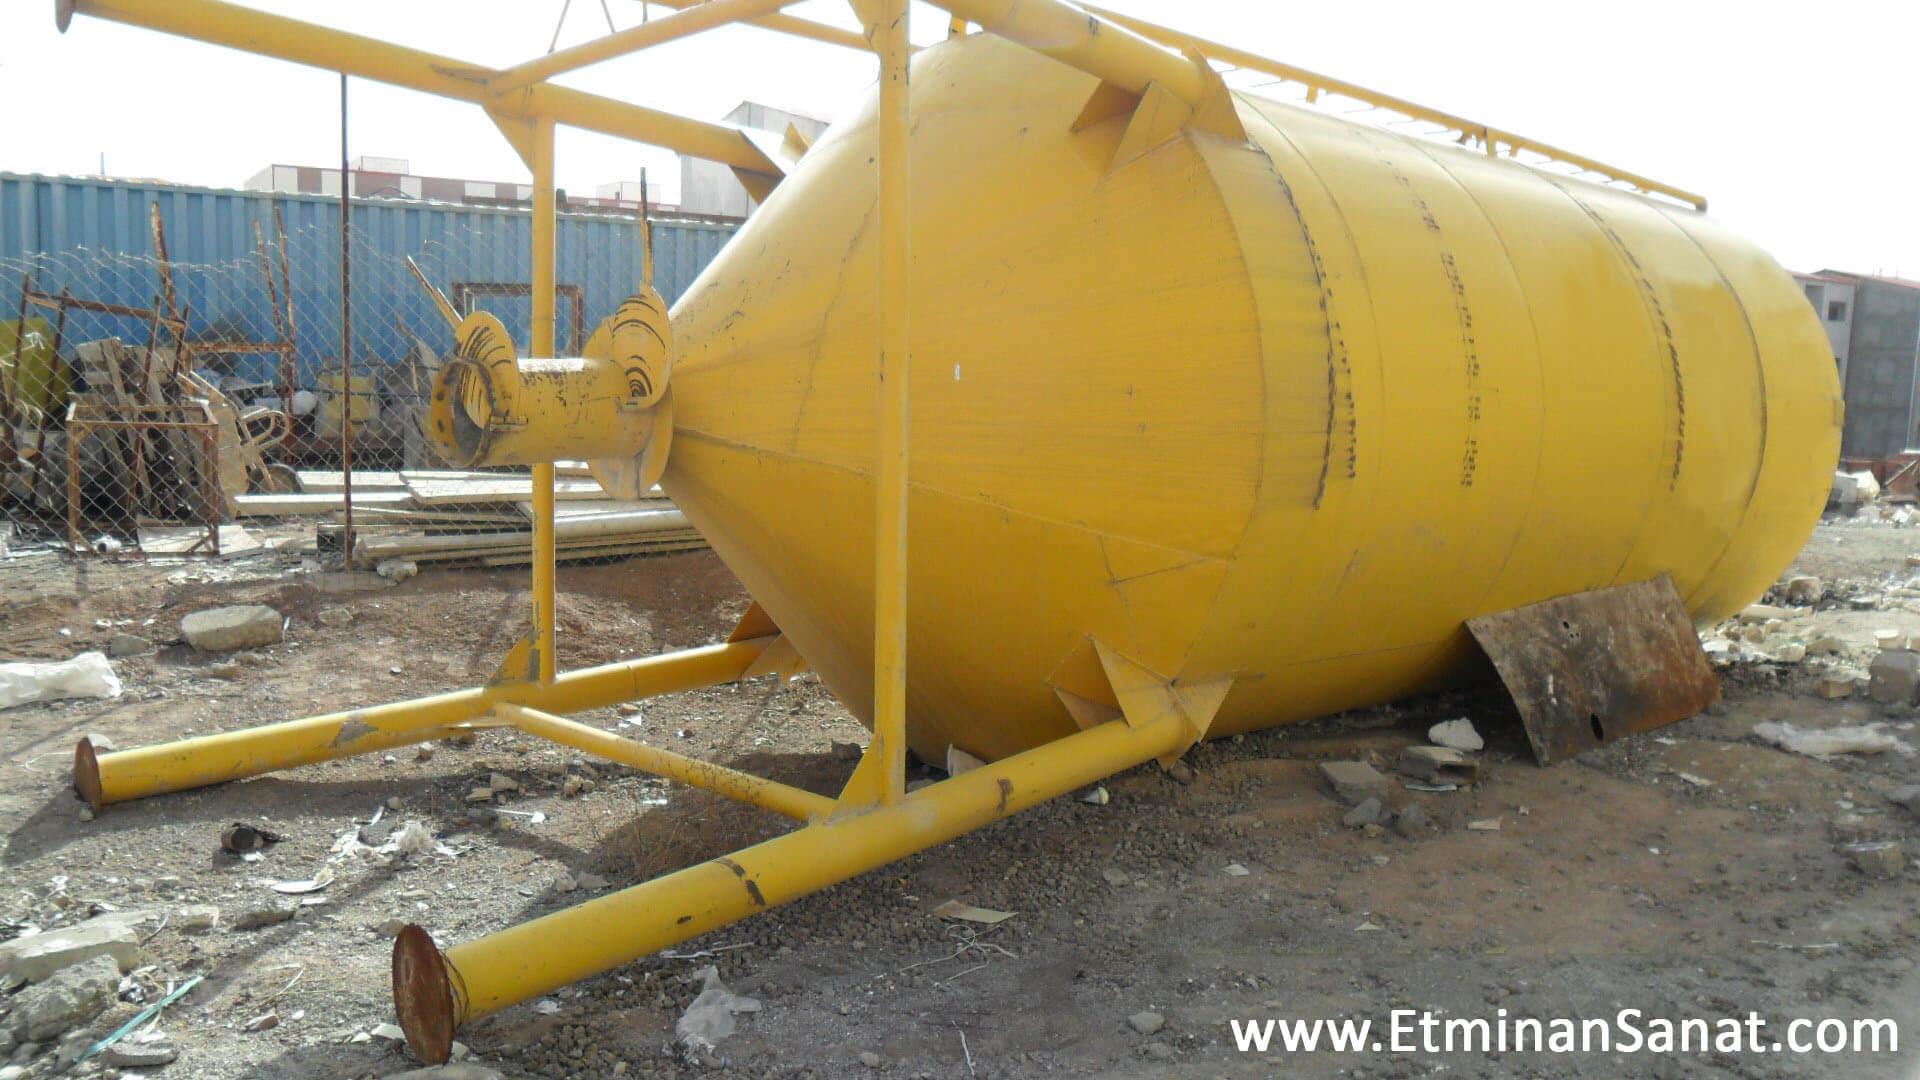 http://www.etminansanat.com/wp-content/gallery/tanker/siloo-1.jpg